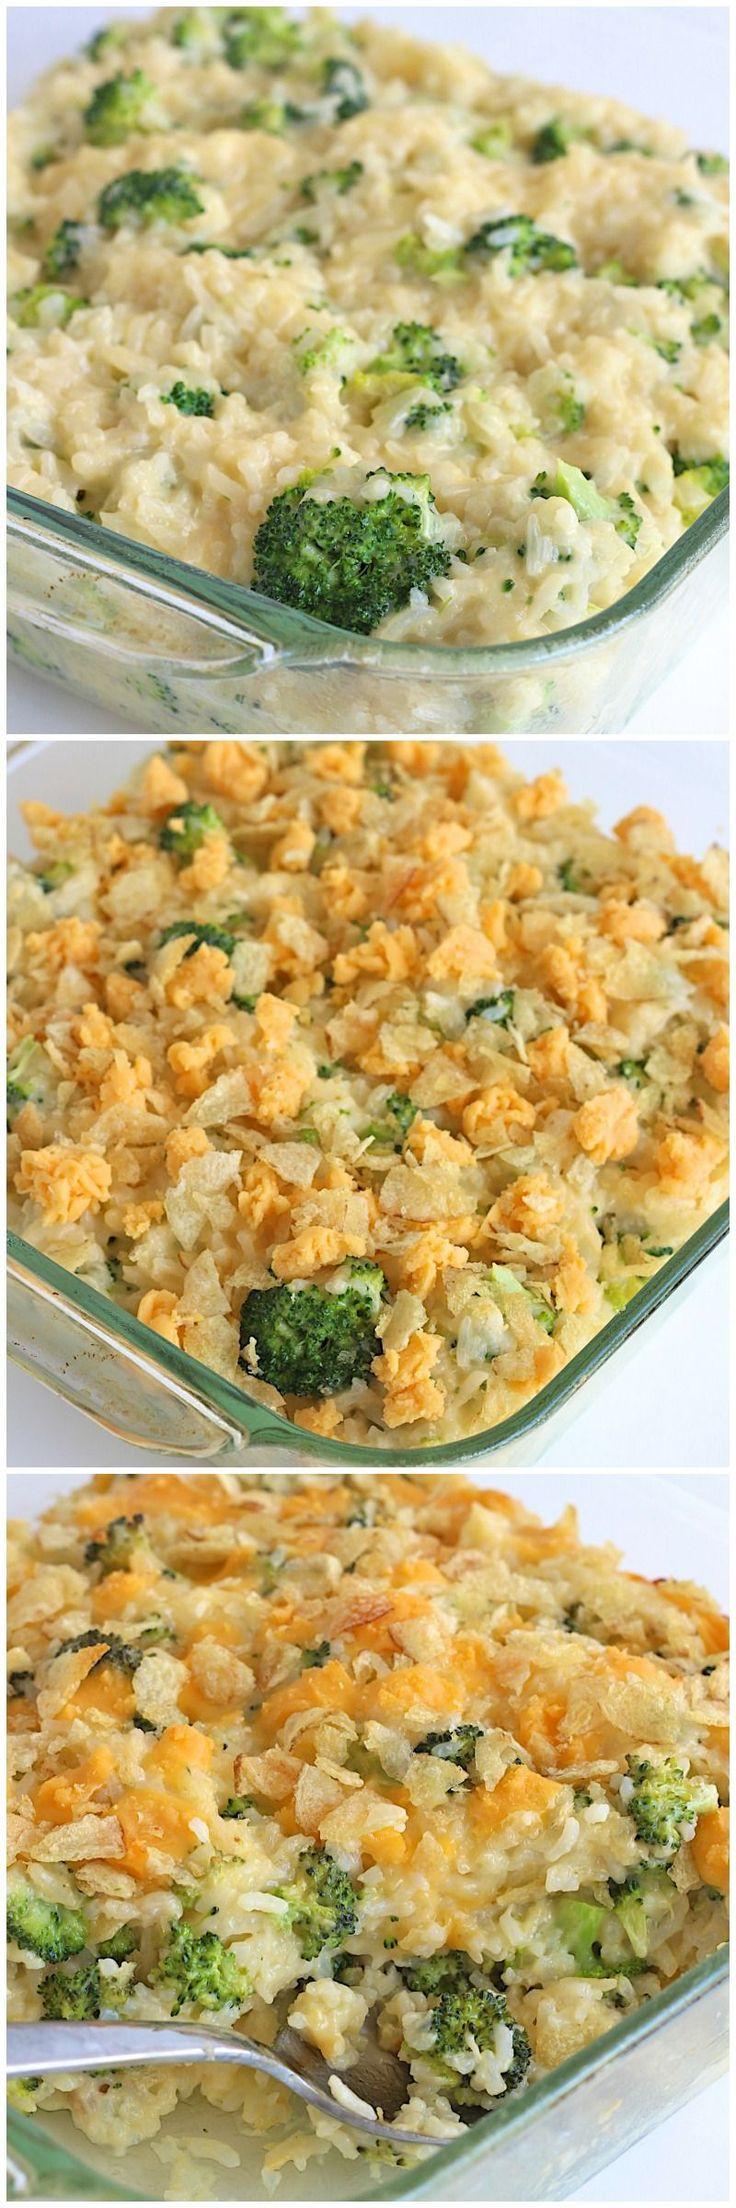 17 Best ideas about Cheesy Broccoli Rice on Pinterest ...